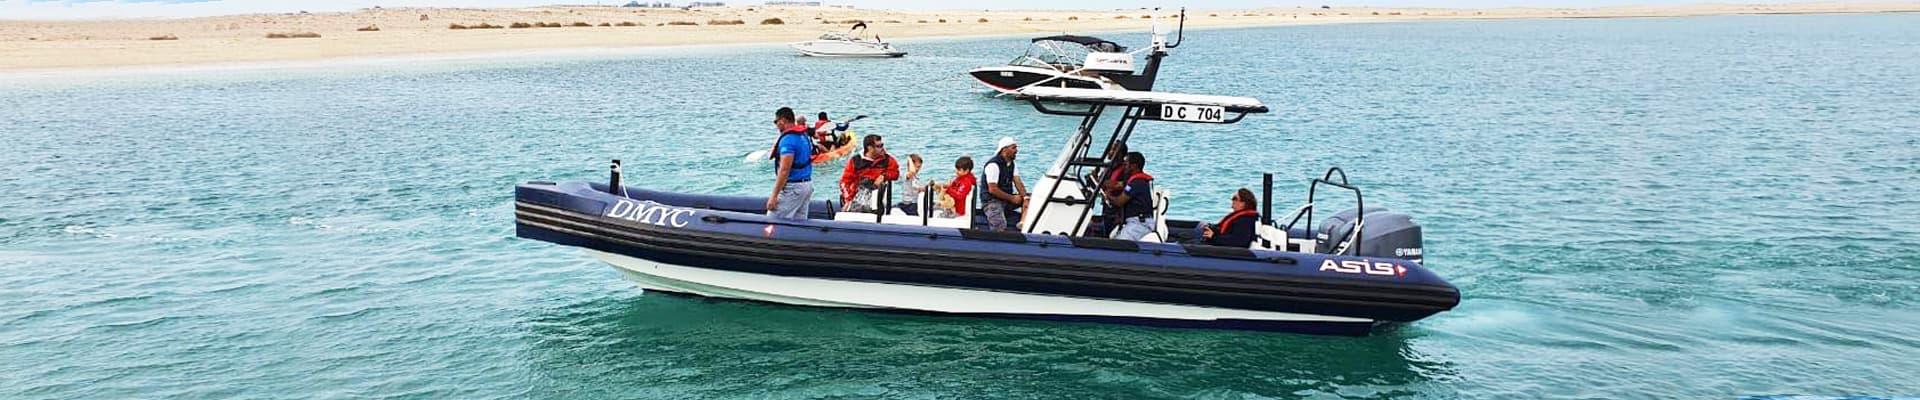 marina-operations-support-boat-marina-operators-boat9-5-m